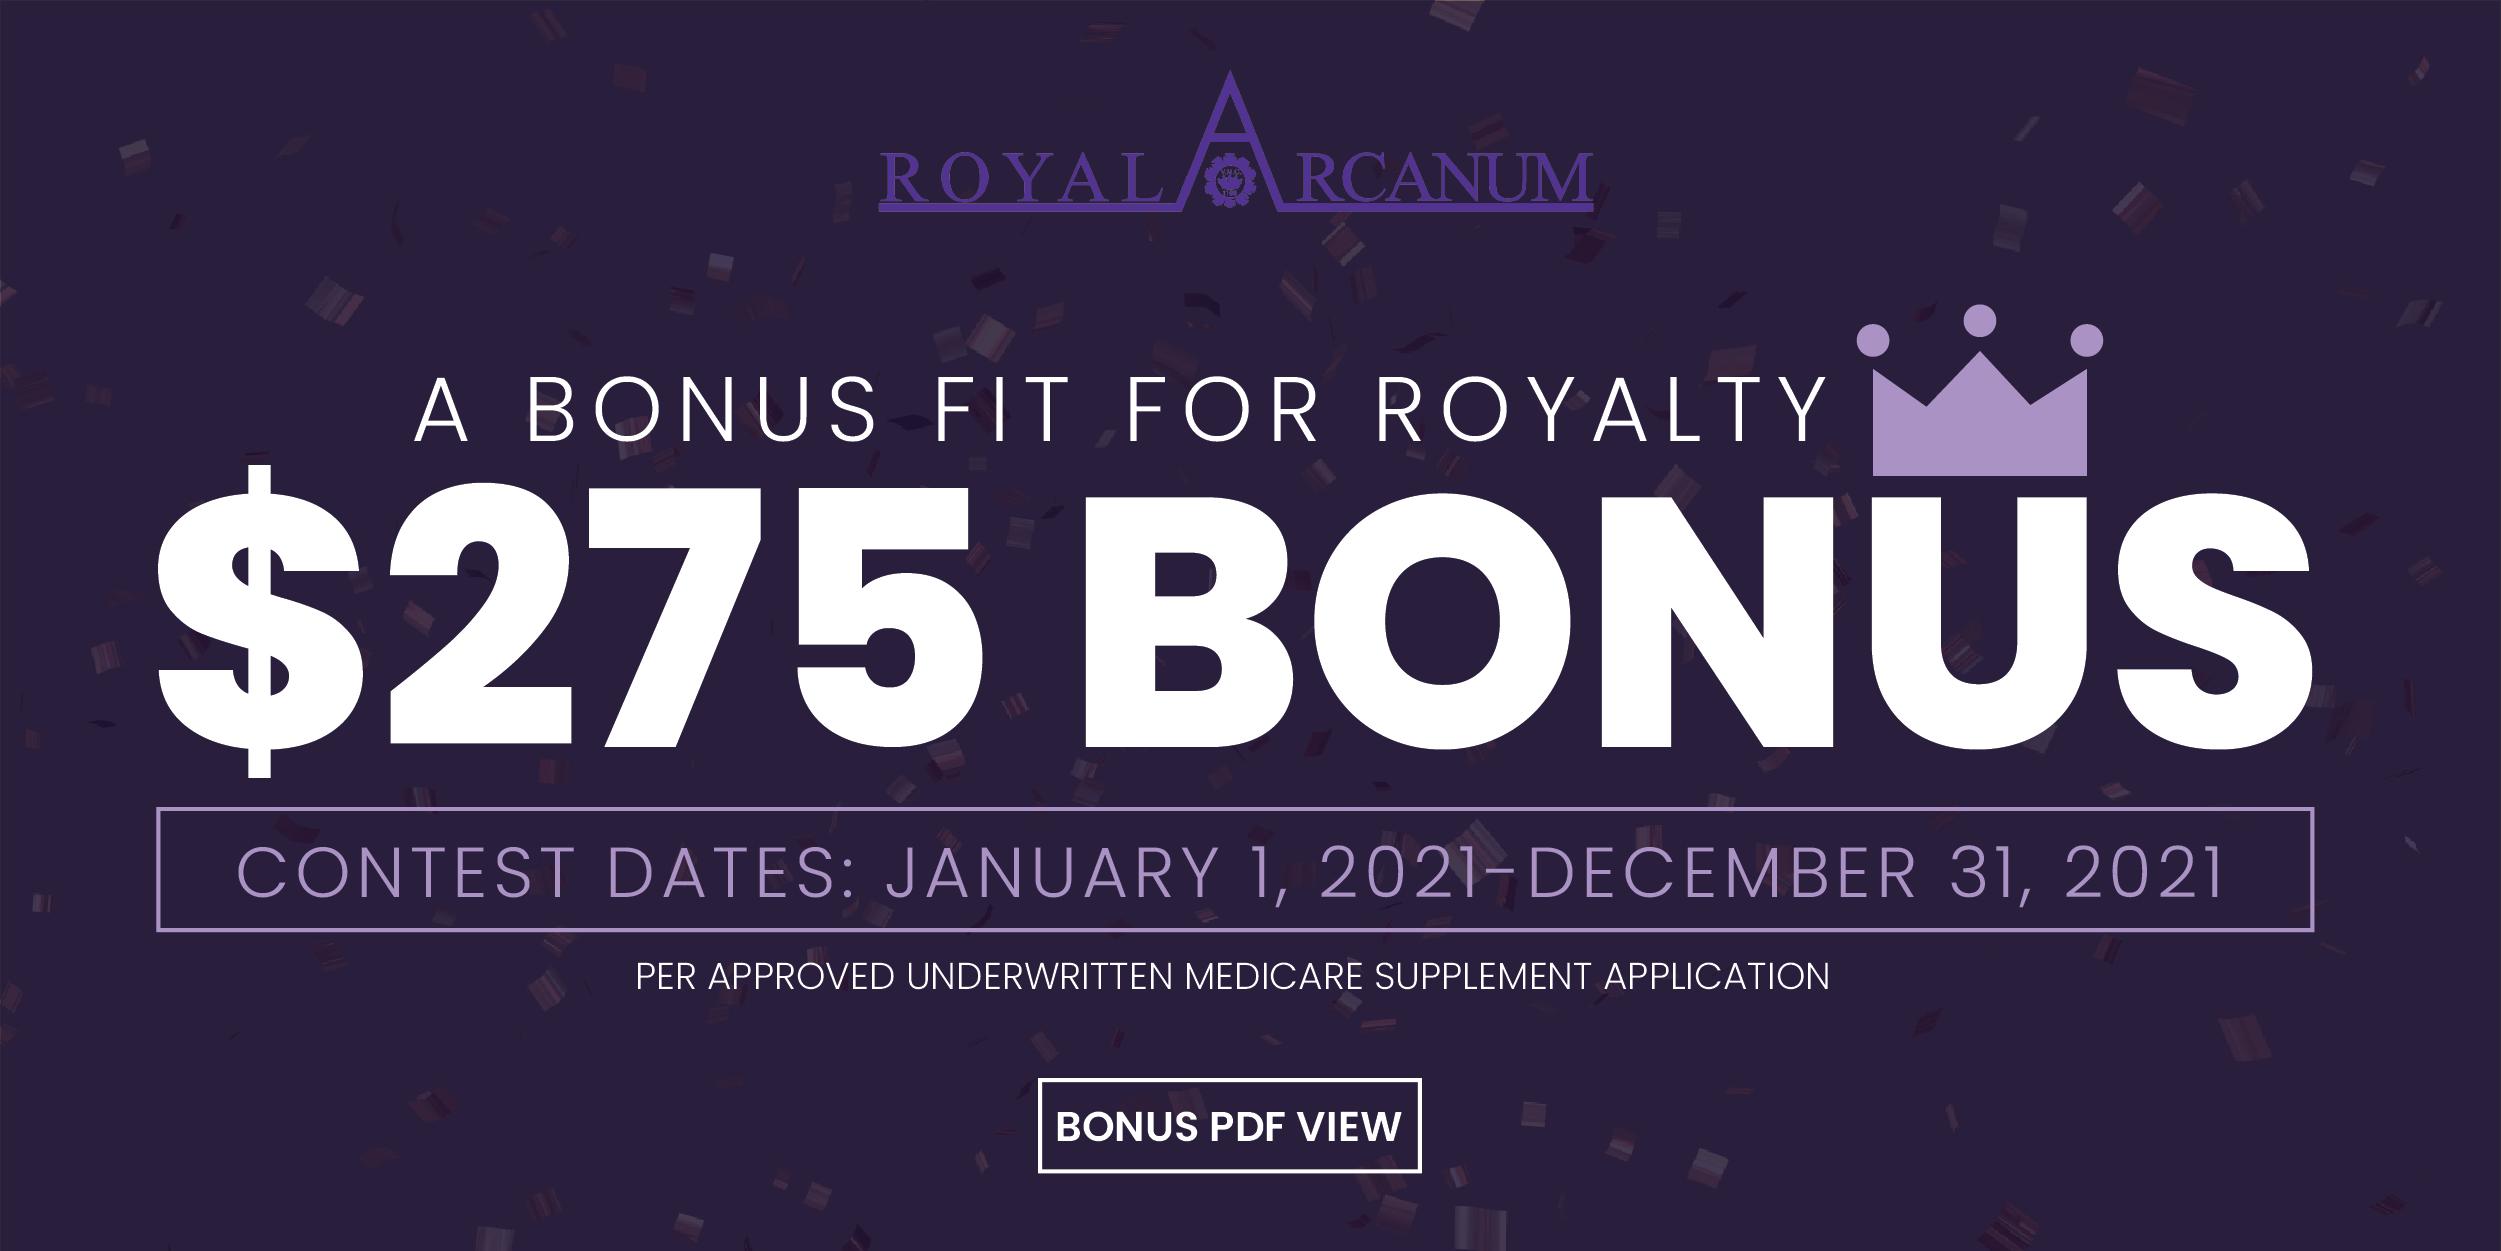 Royal Arcanum Medicare Supplement Cash Bonus